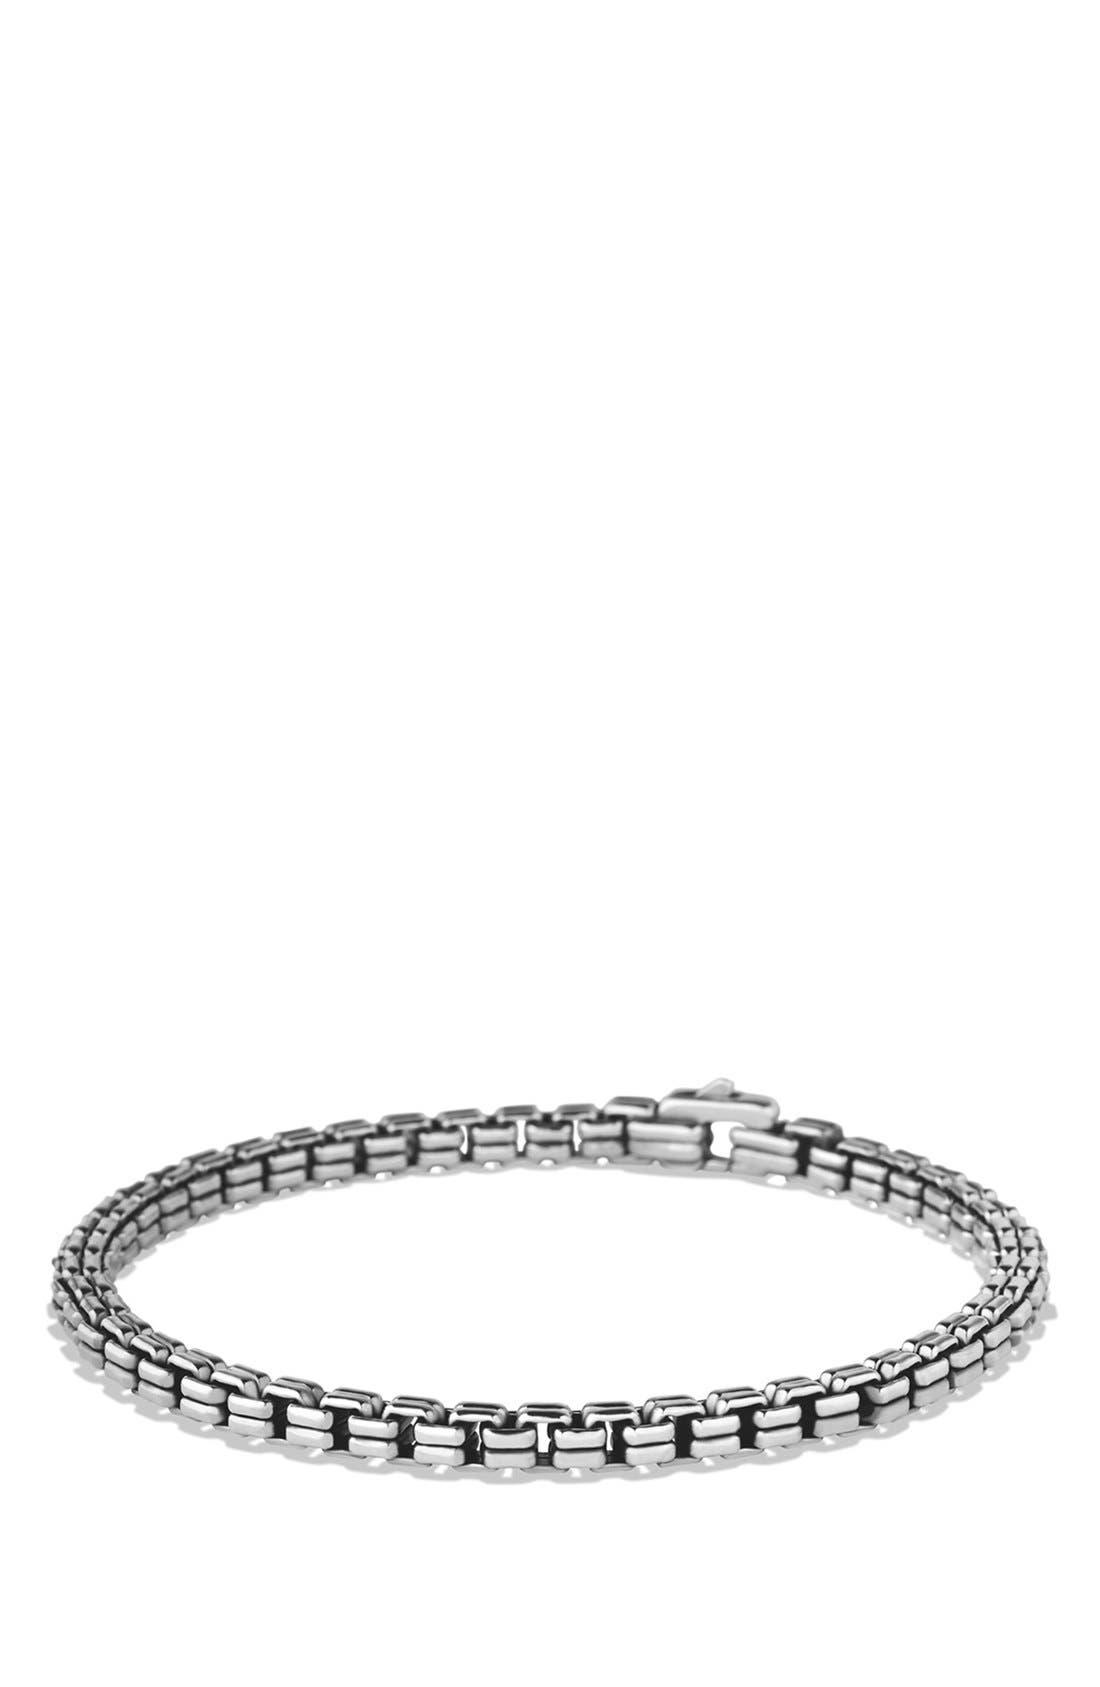 DAVID YURMAN 'Chain' Double Box Chain Bracelet, Main, color, 040